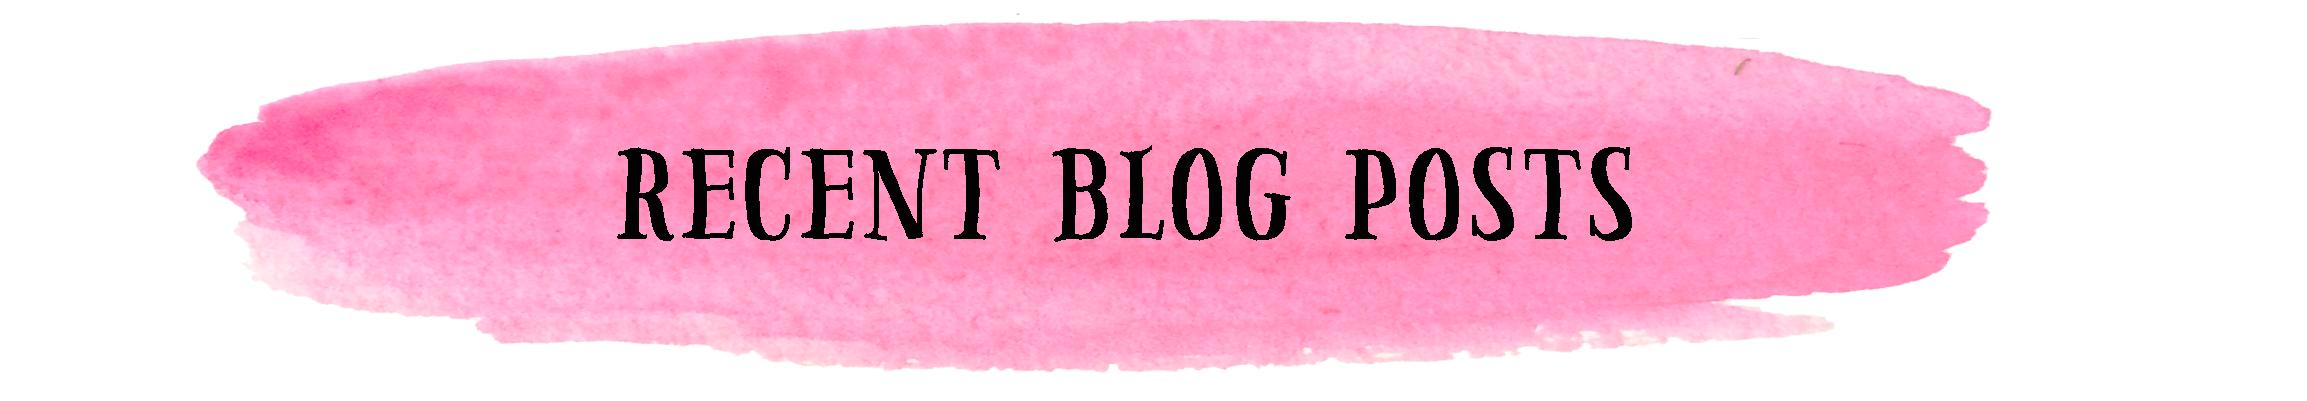 recent blog posts.png